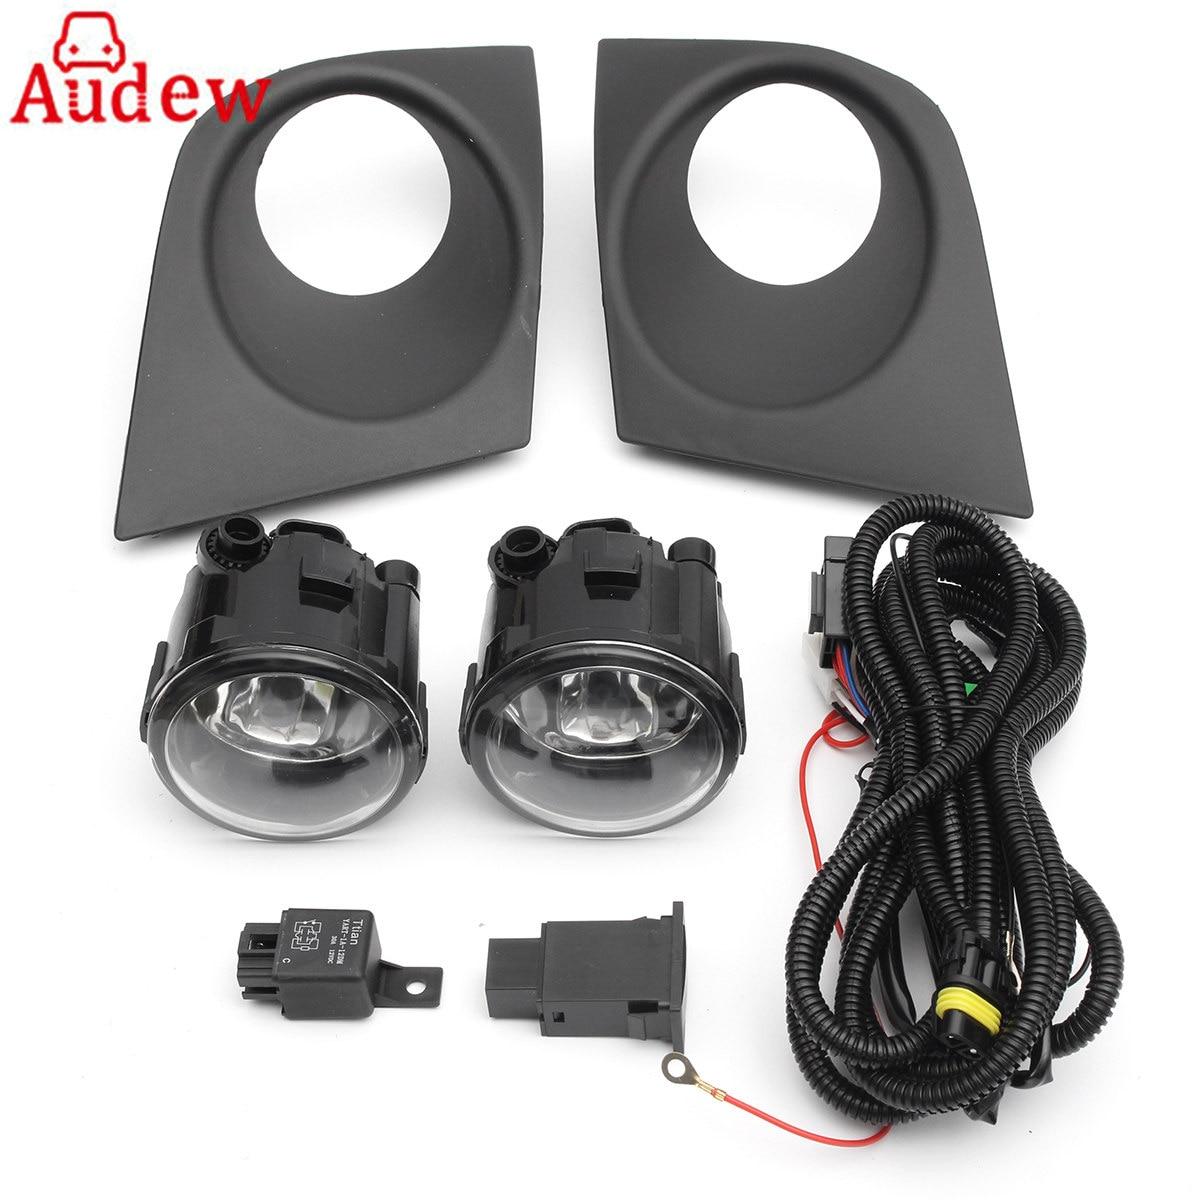 4 Wired Fog Light Switch For Nissan Tiida  //Micra //Almera //Versa